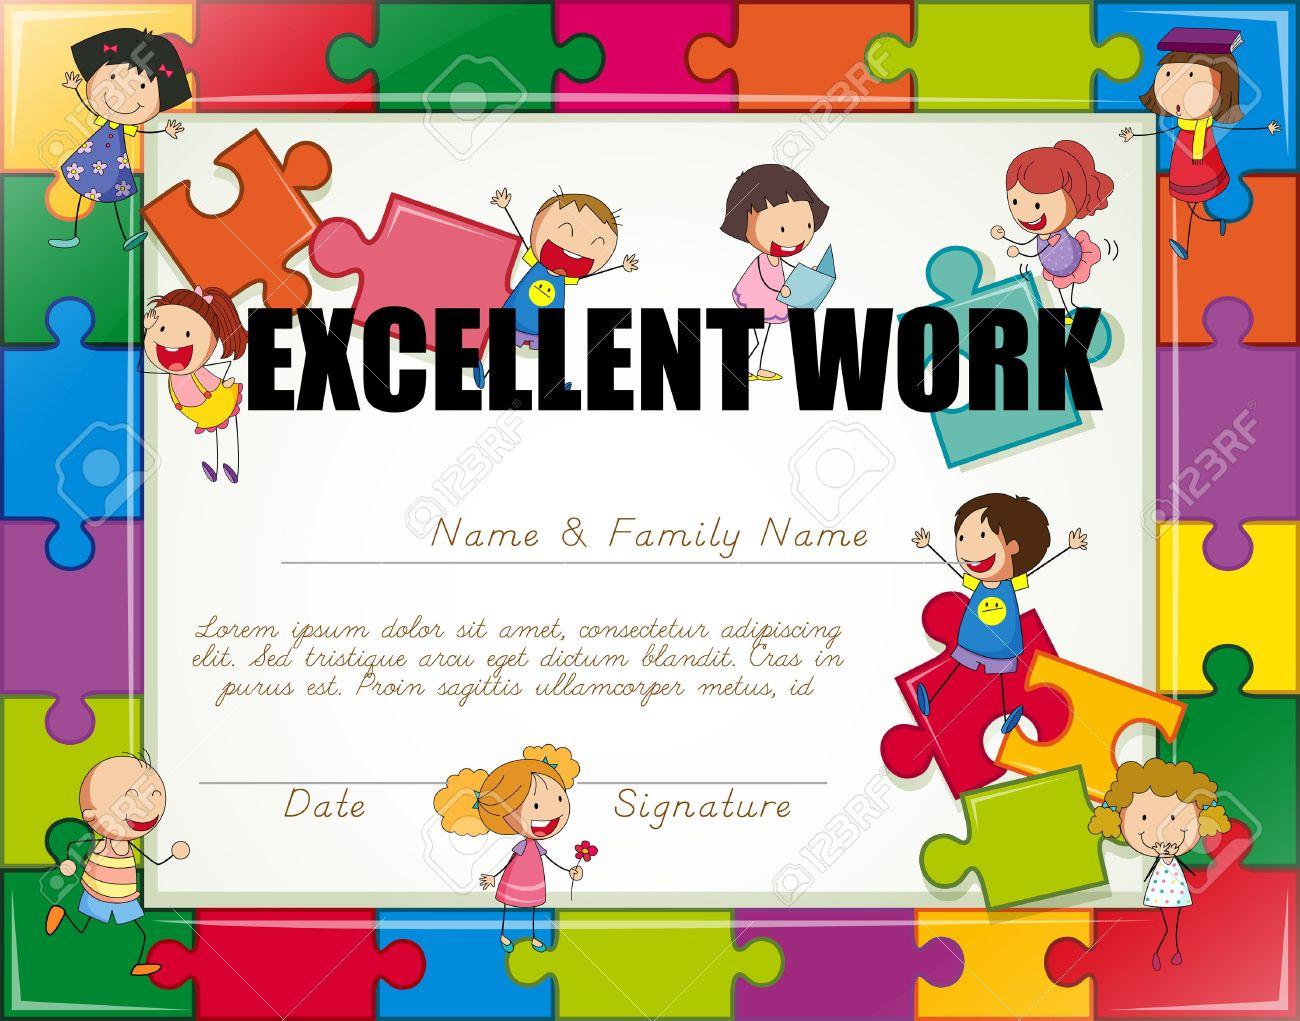 Kids Certificate Border Engneforic